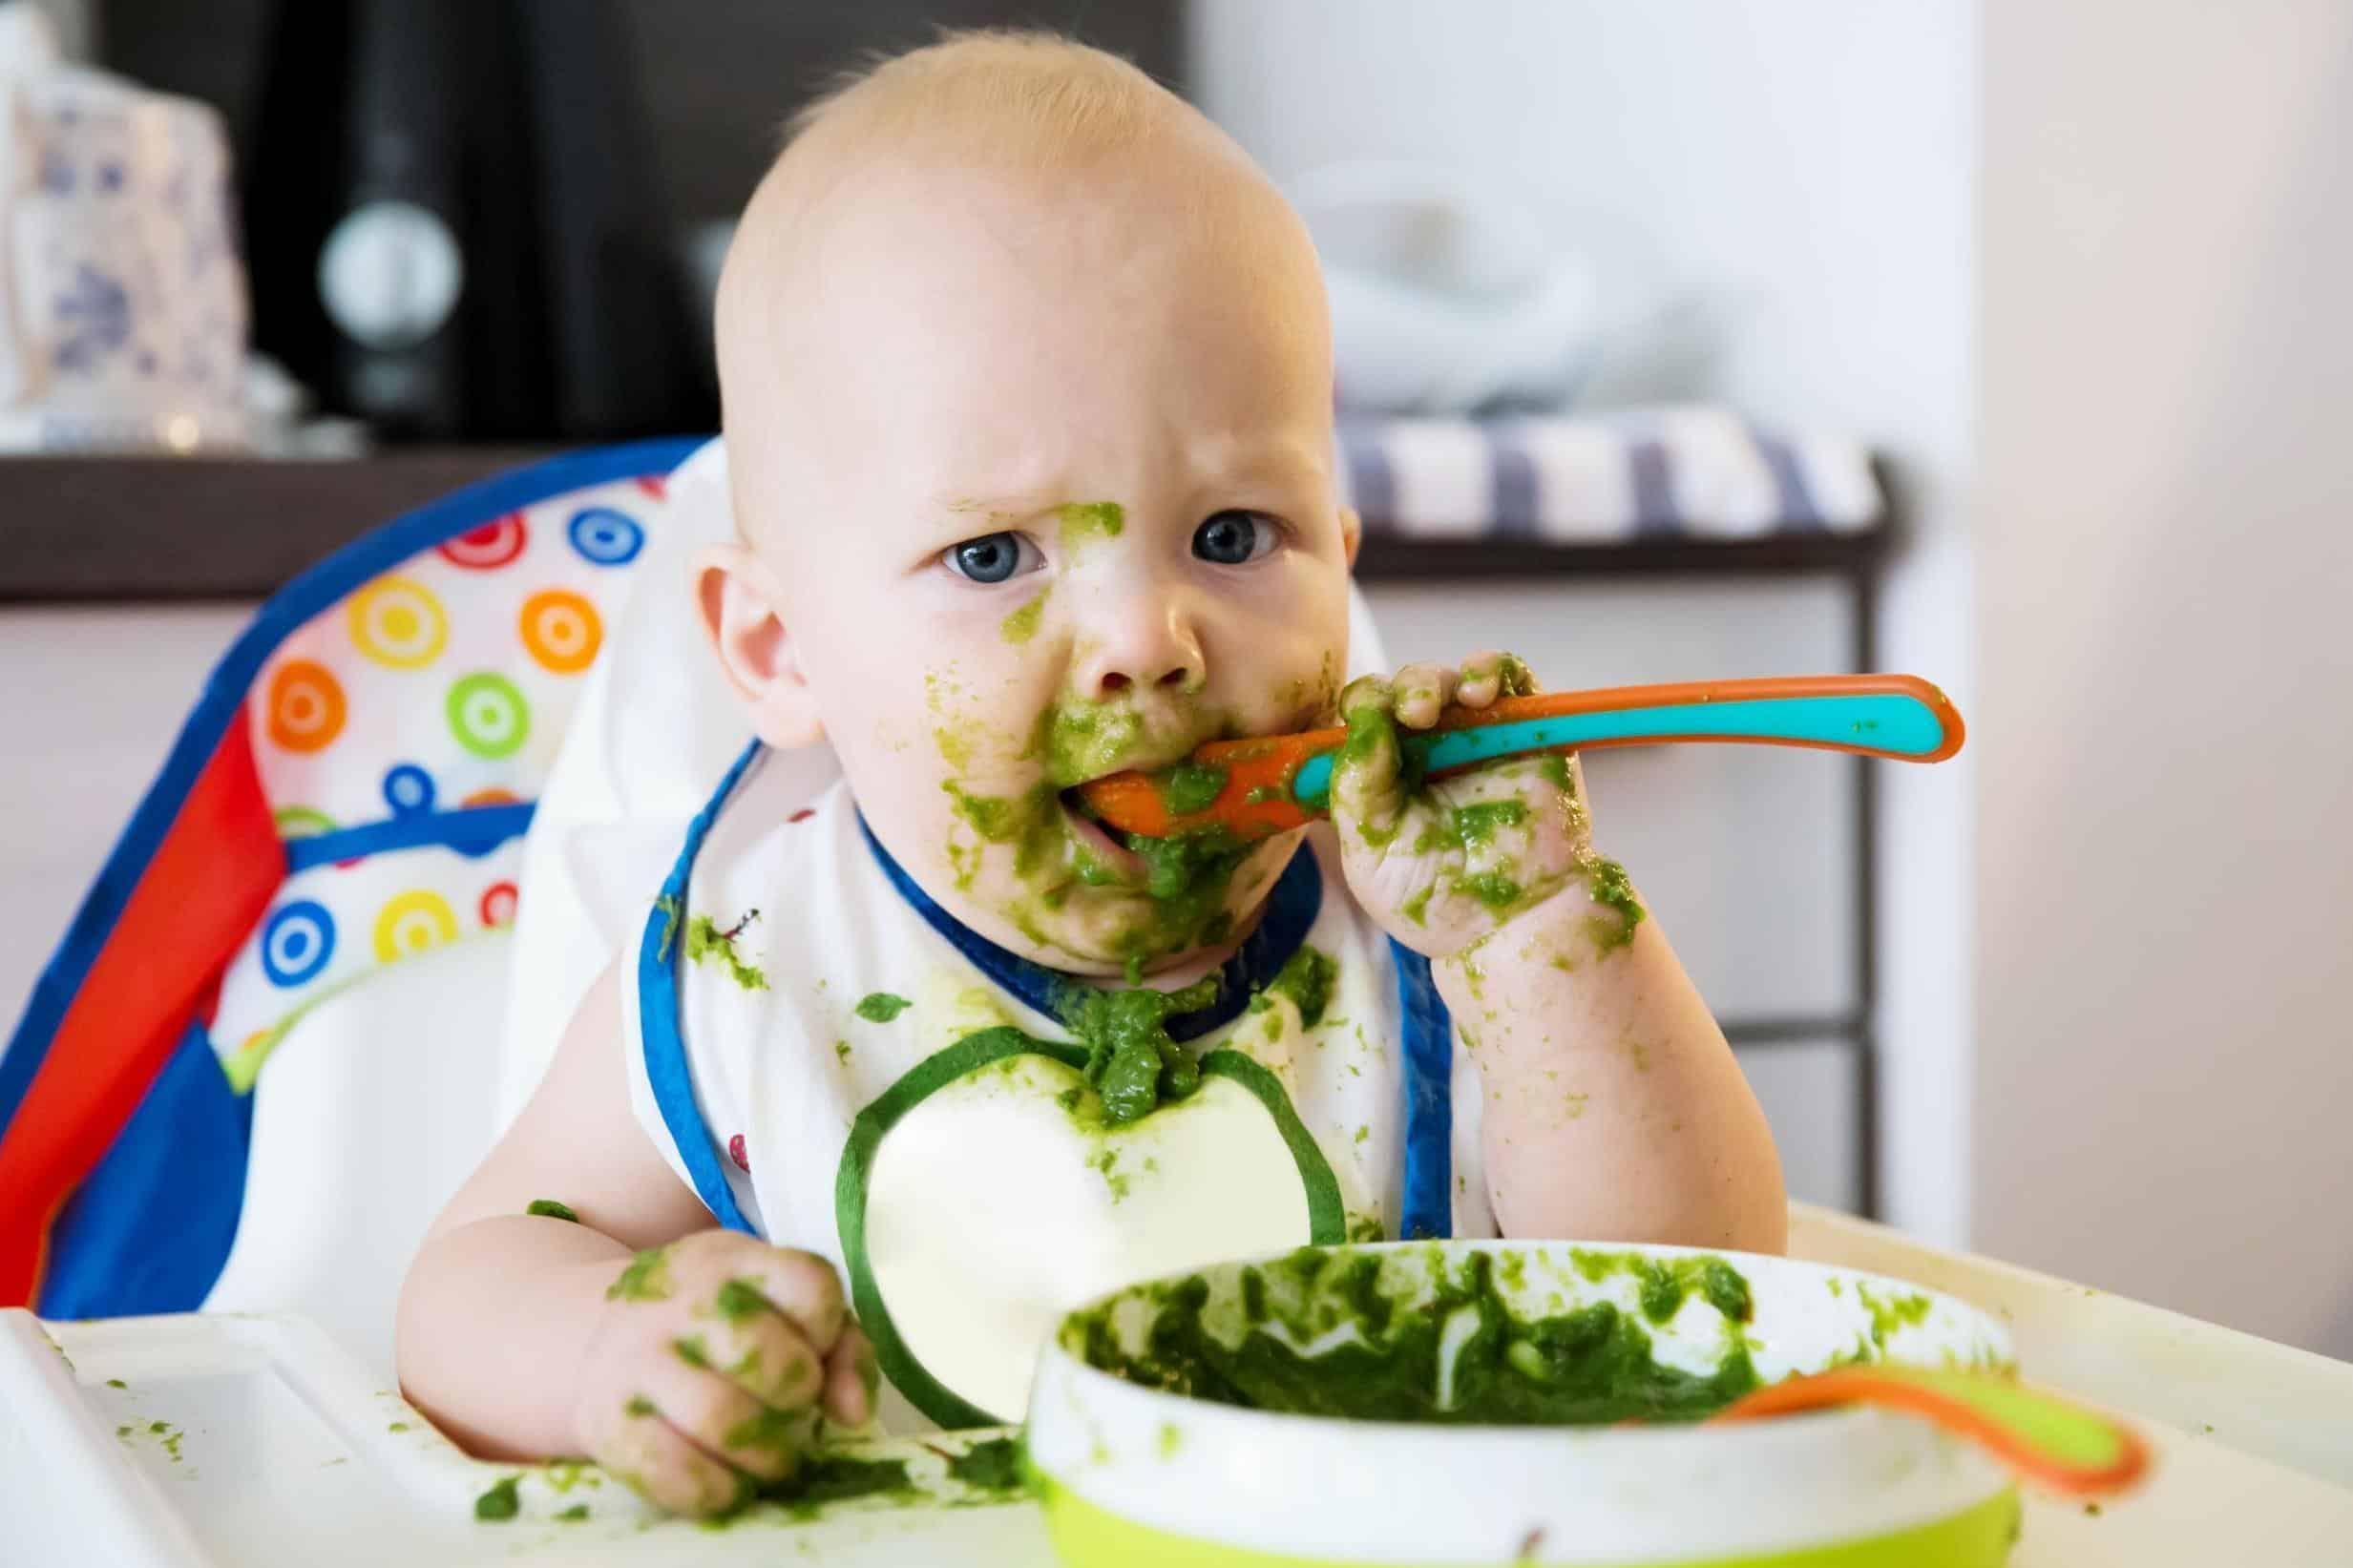 Key nutrients to help your children feel happier, healthier and smarter